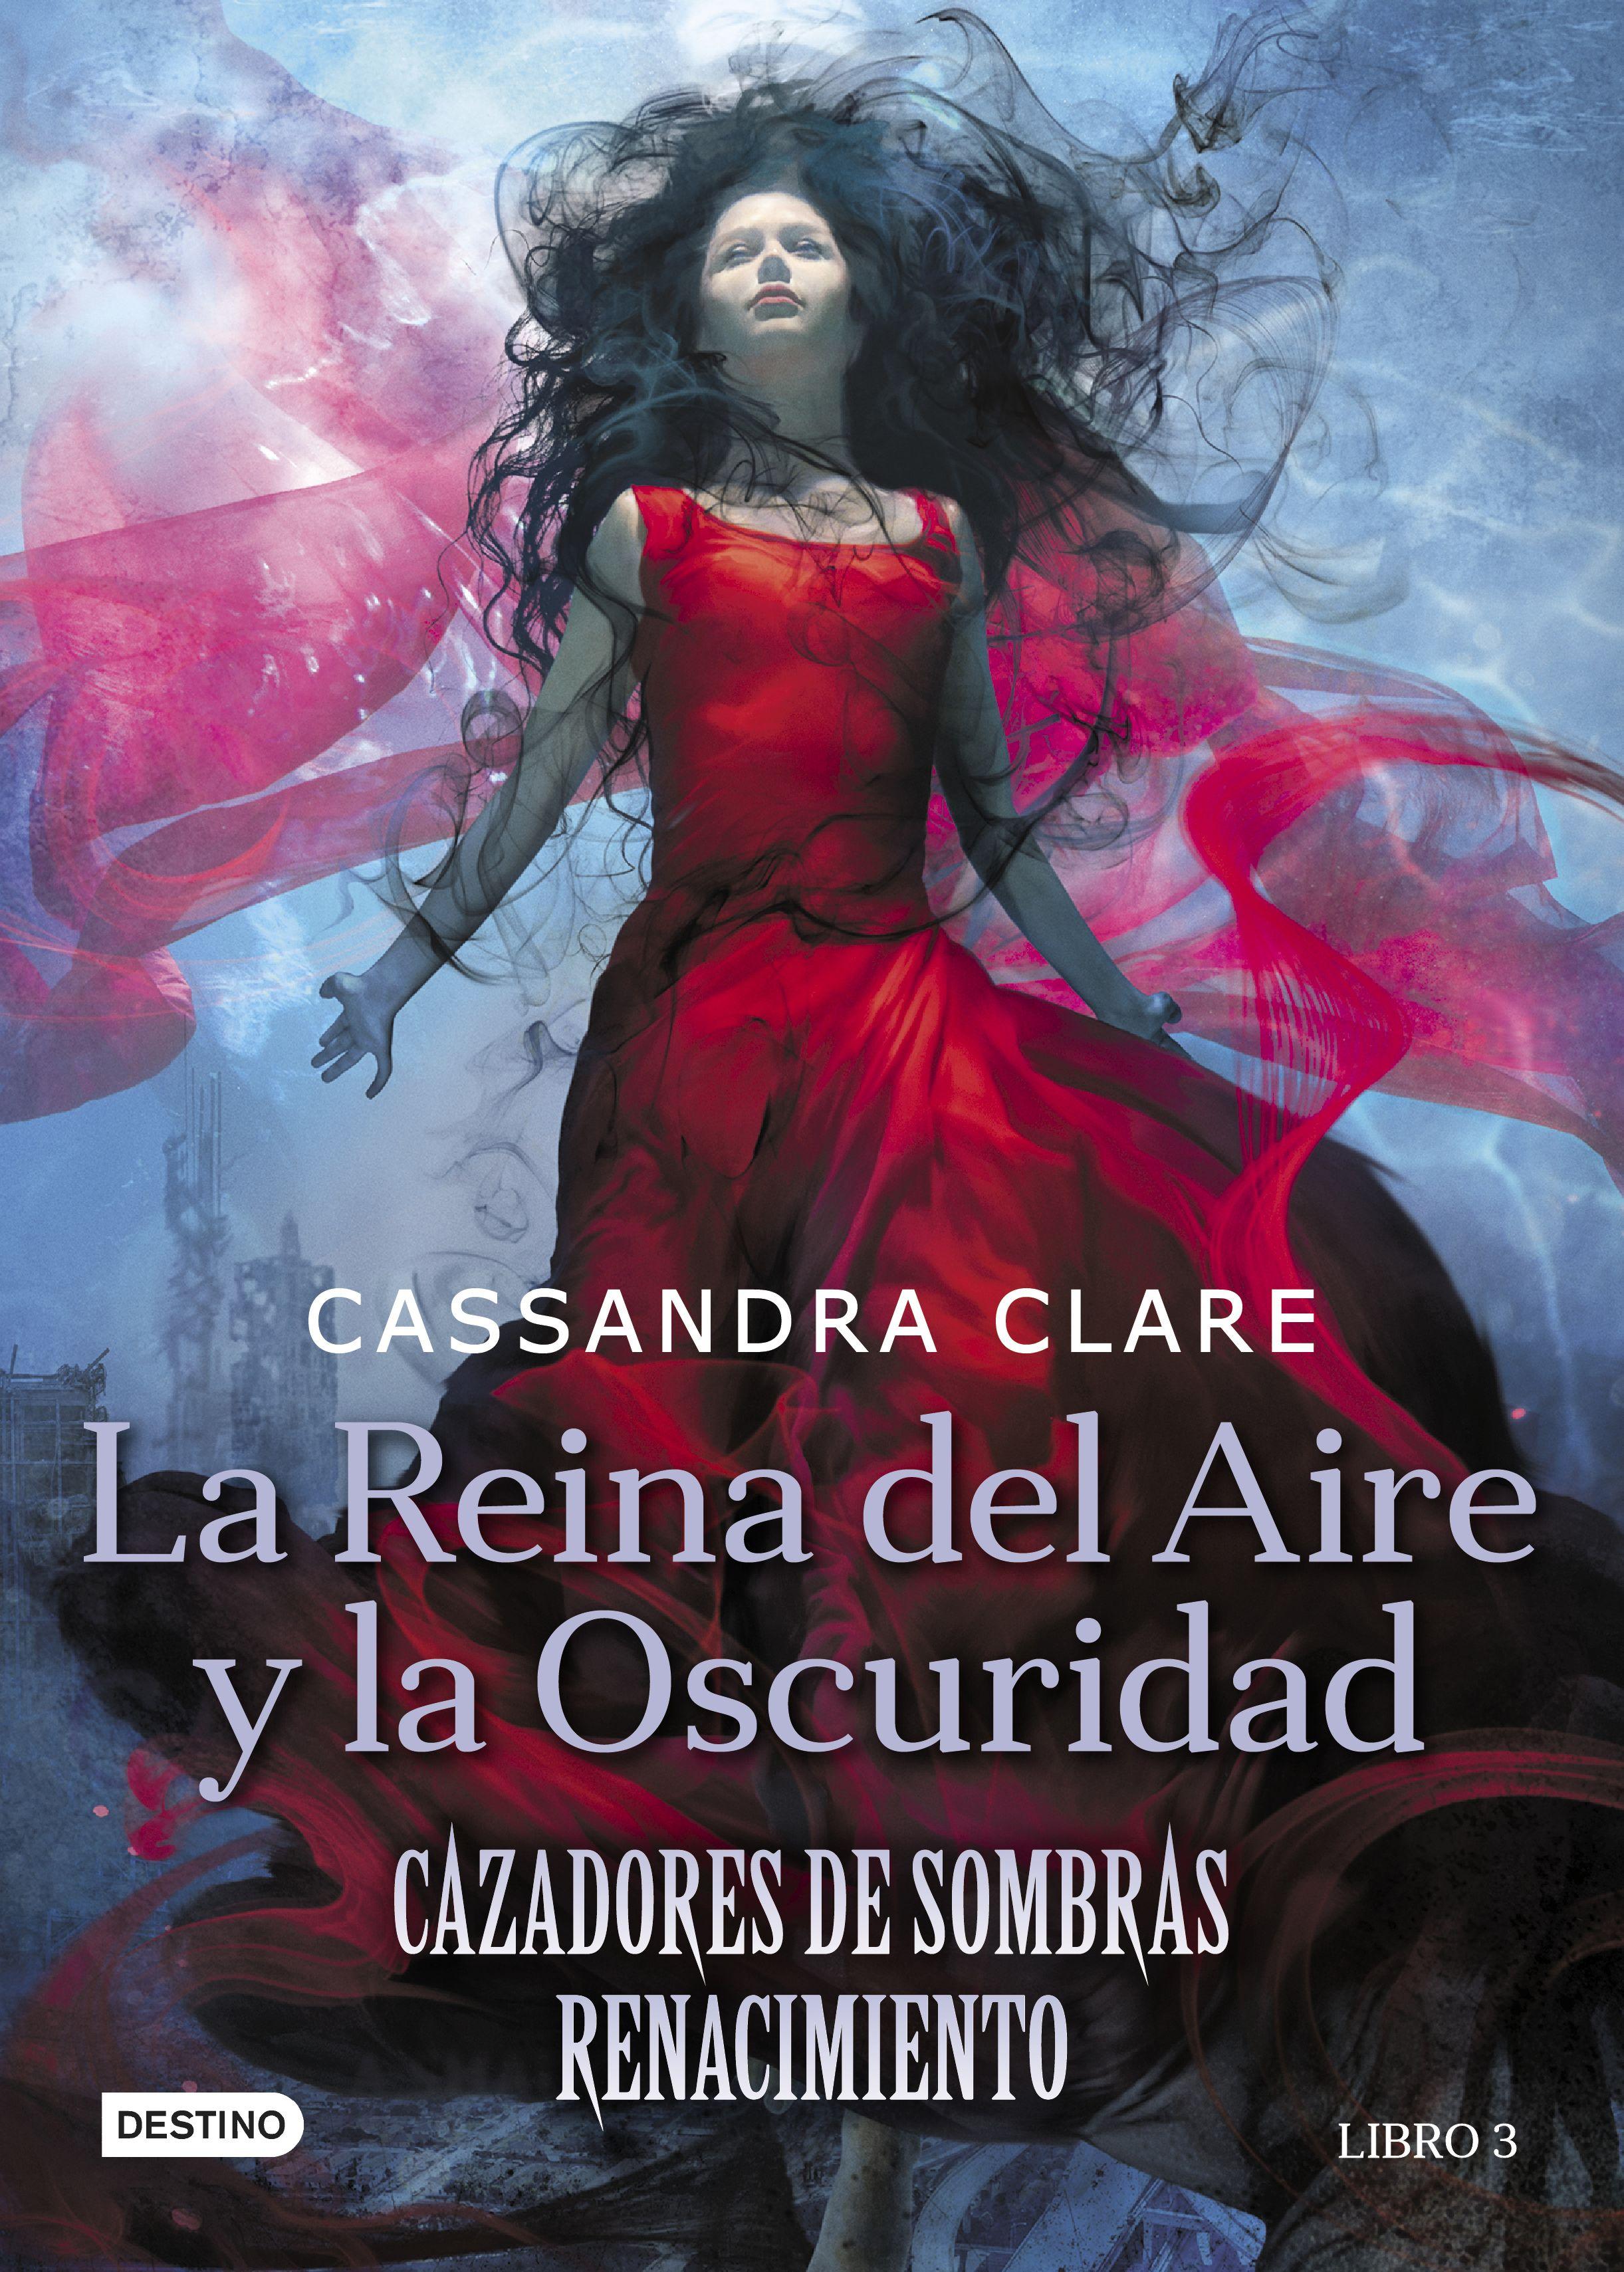 La Reina del Aire y la Oscuridad - Cassandra Clare - Destino